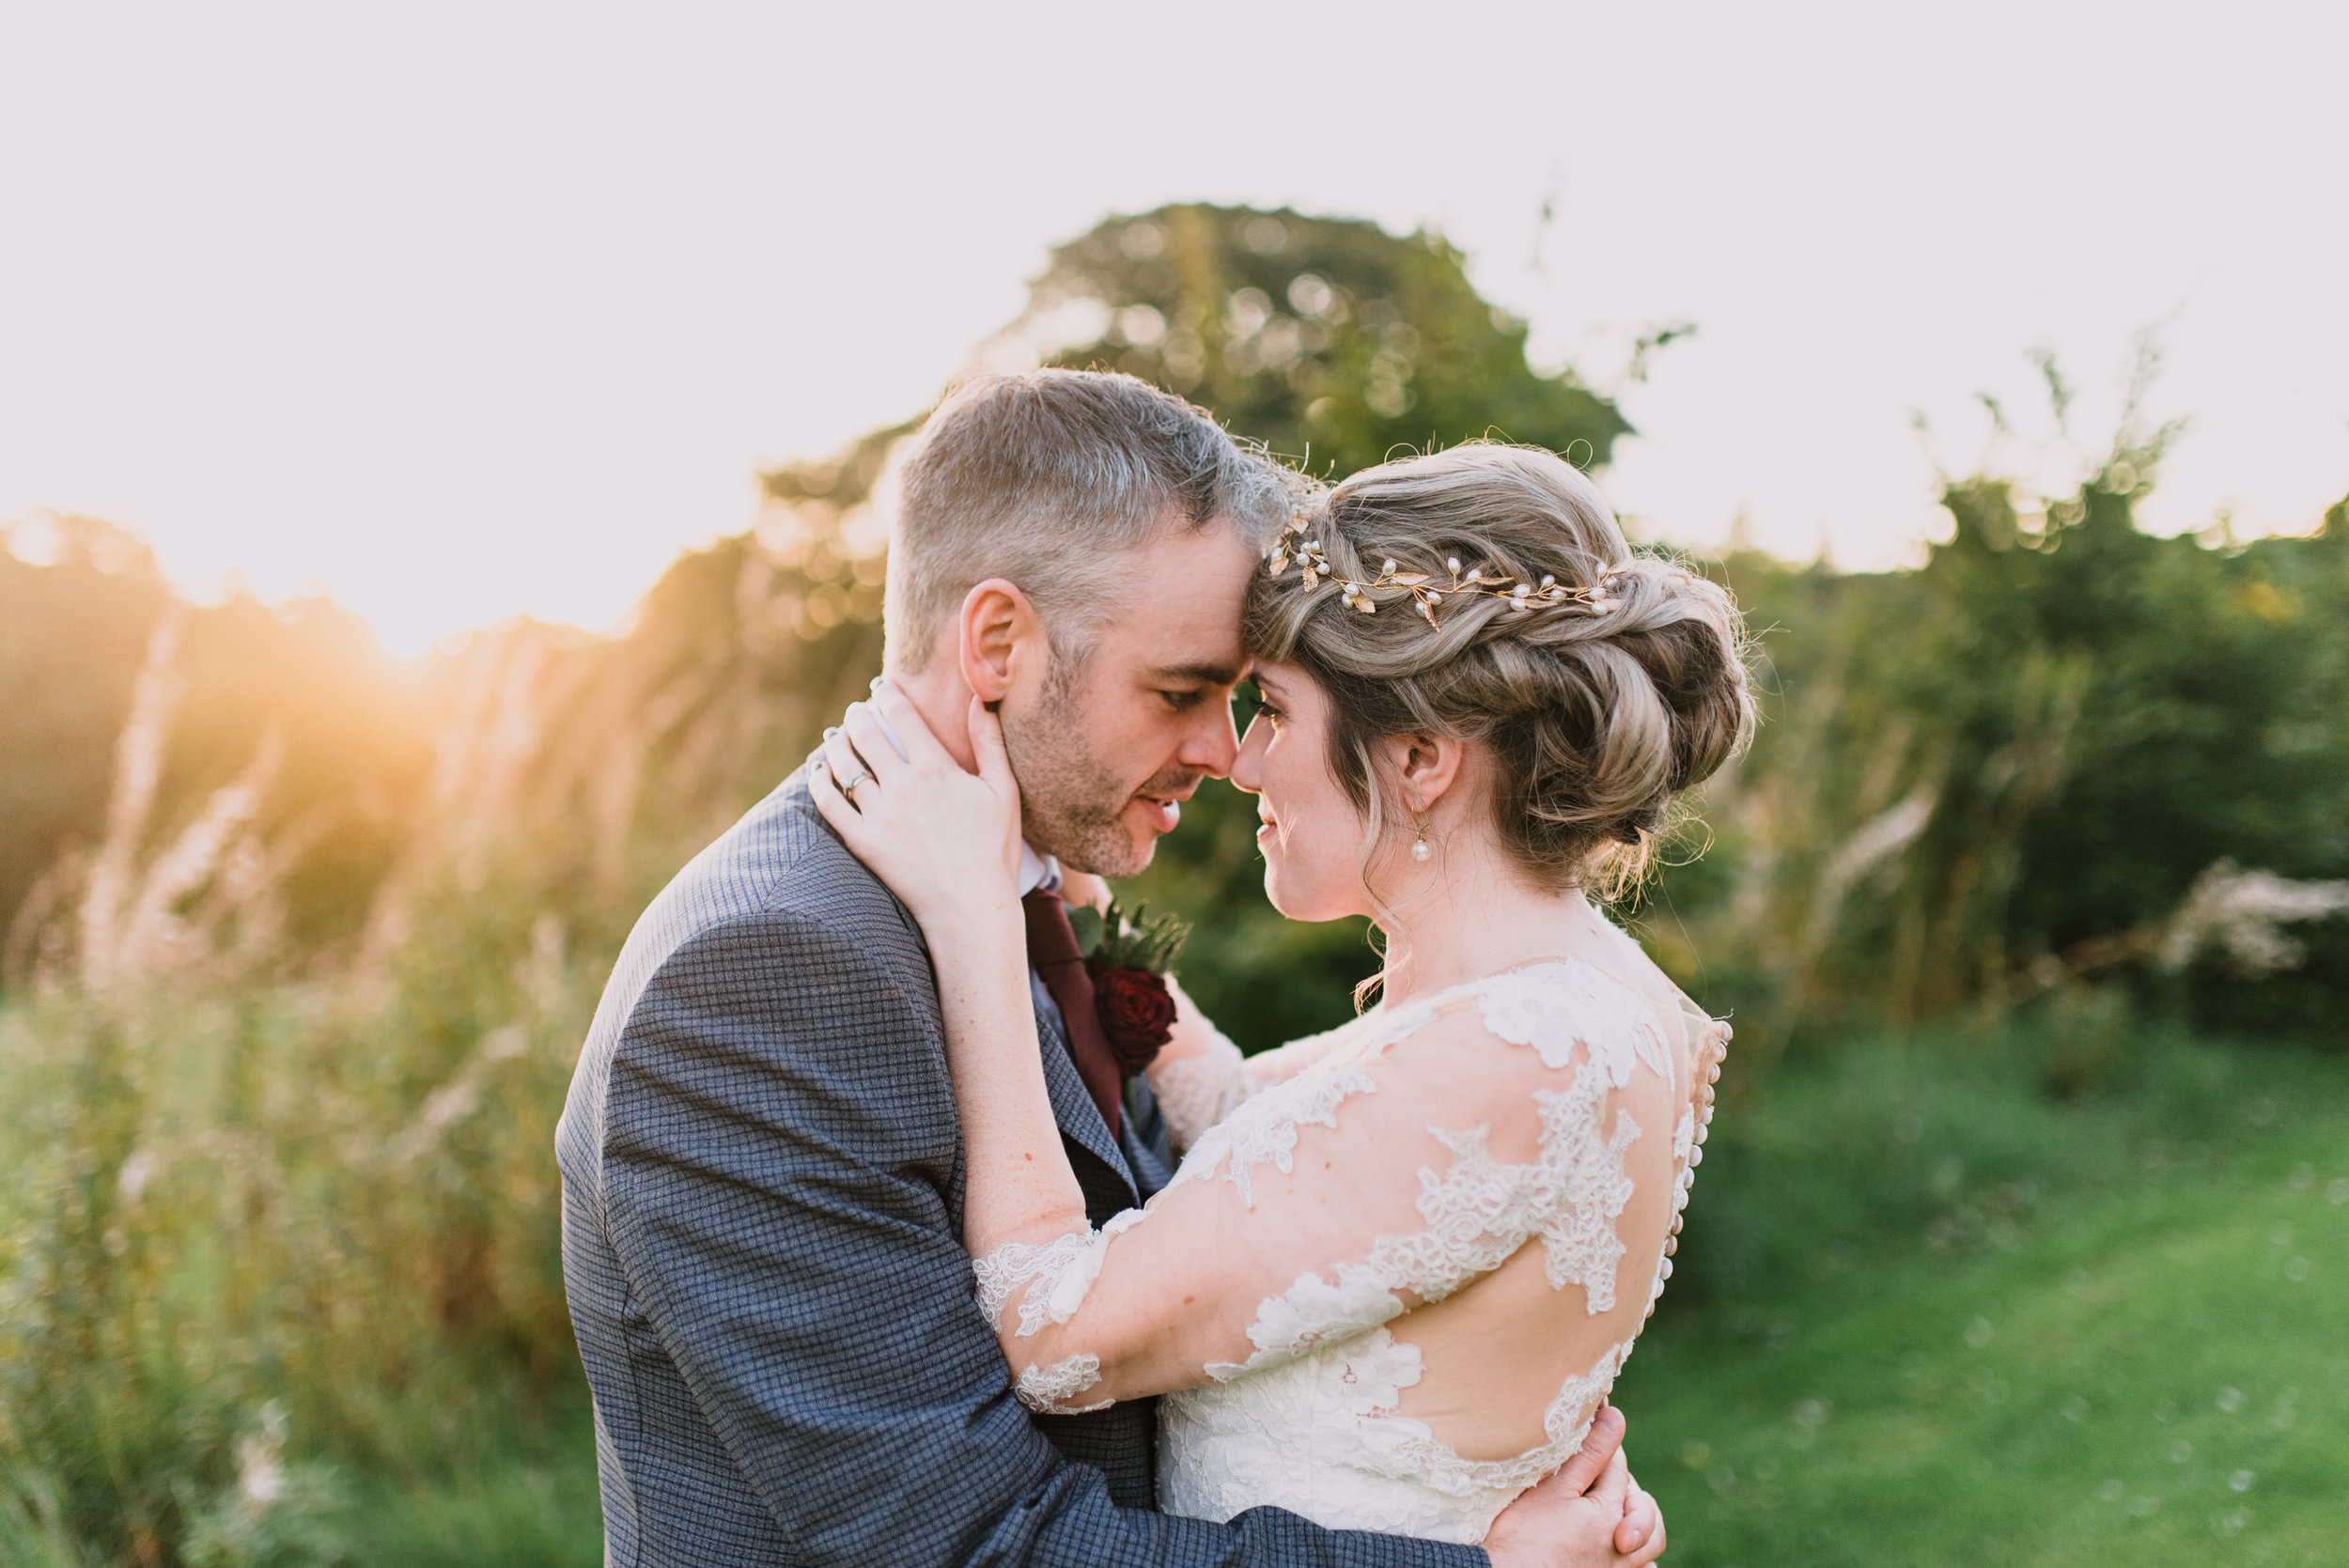 lissanoure castle wedding, northern ireland wedding photographer, romantic northern irish wedding venue, castle wedding ireland, natural wedding photography ni (122).jpg